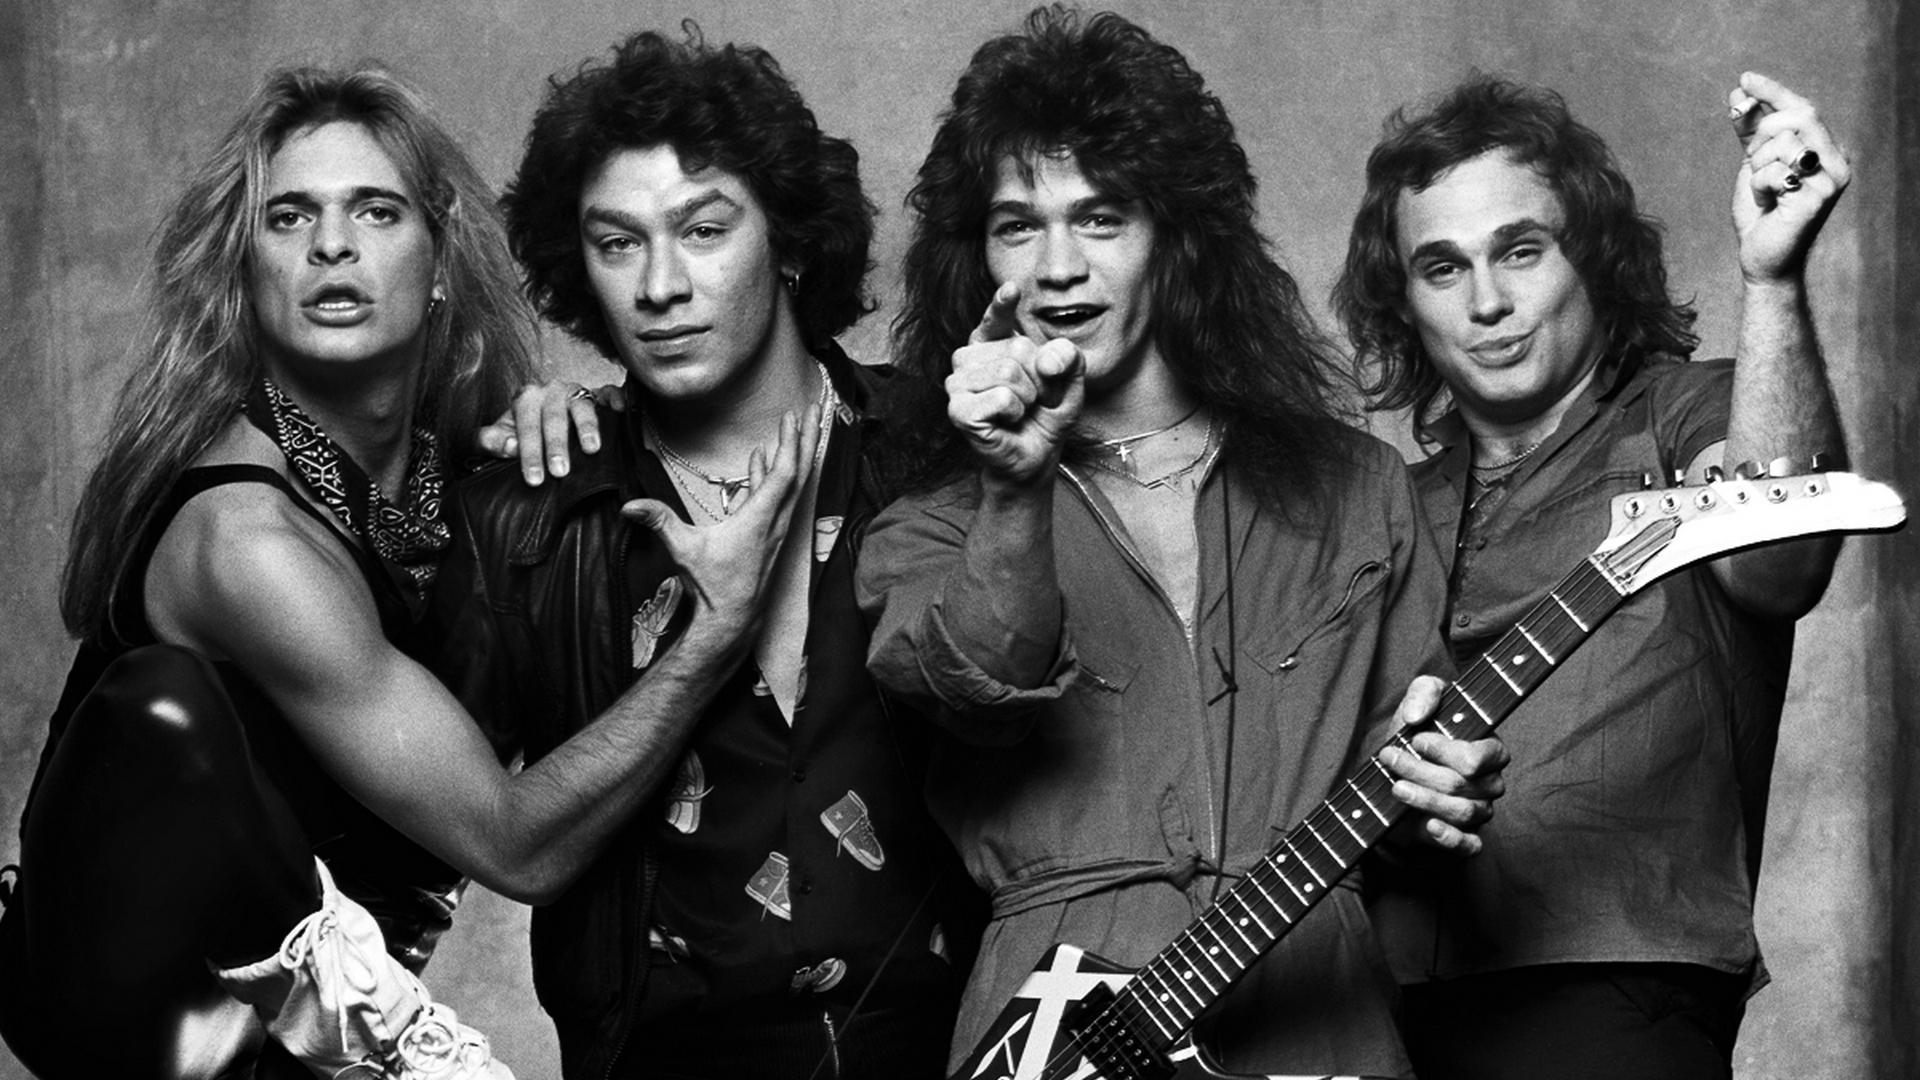 Van-Halen-Won't-Unite